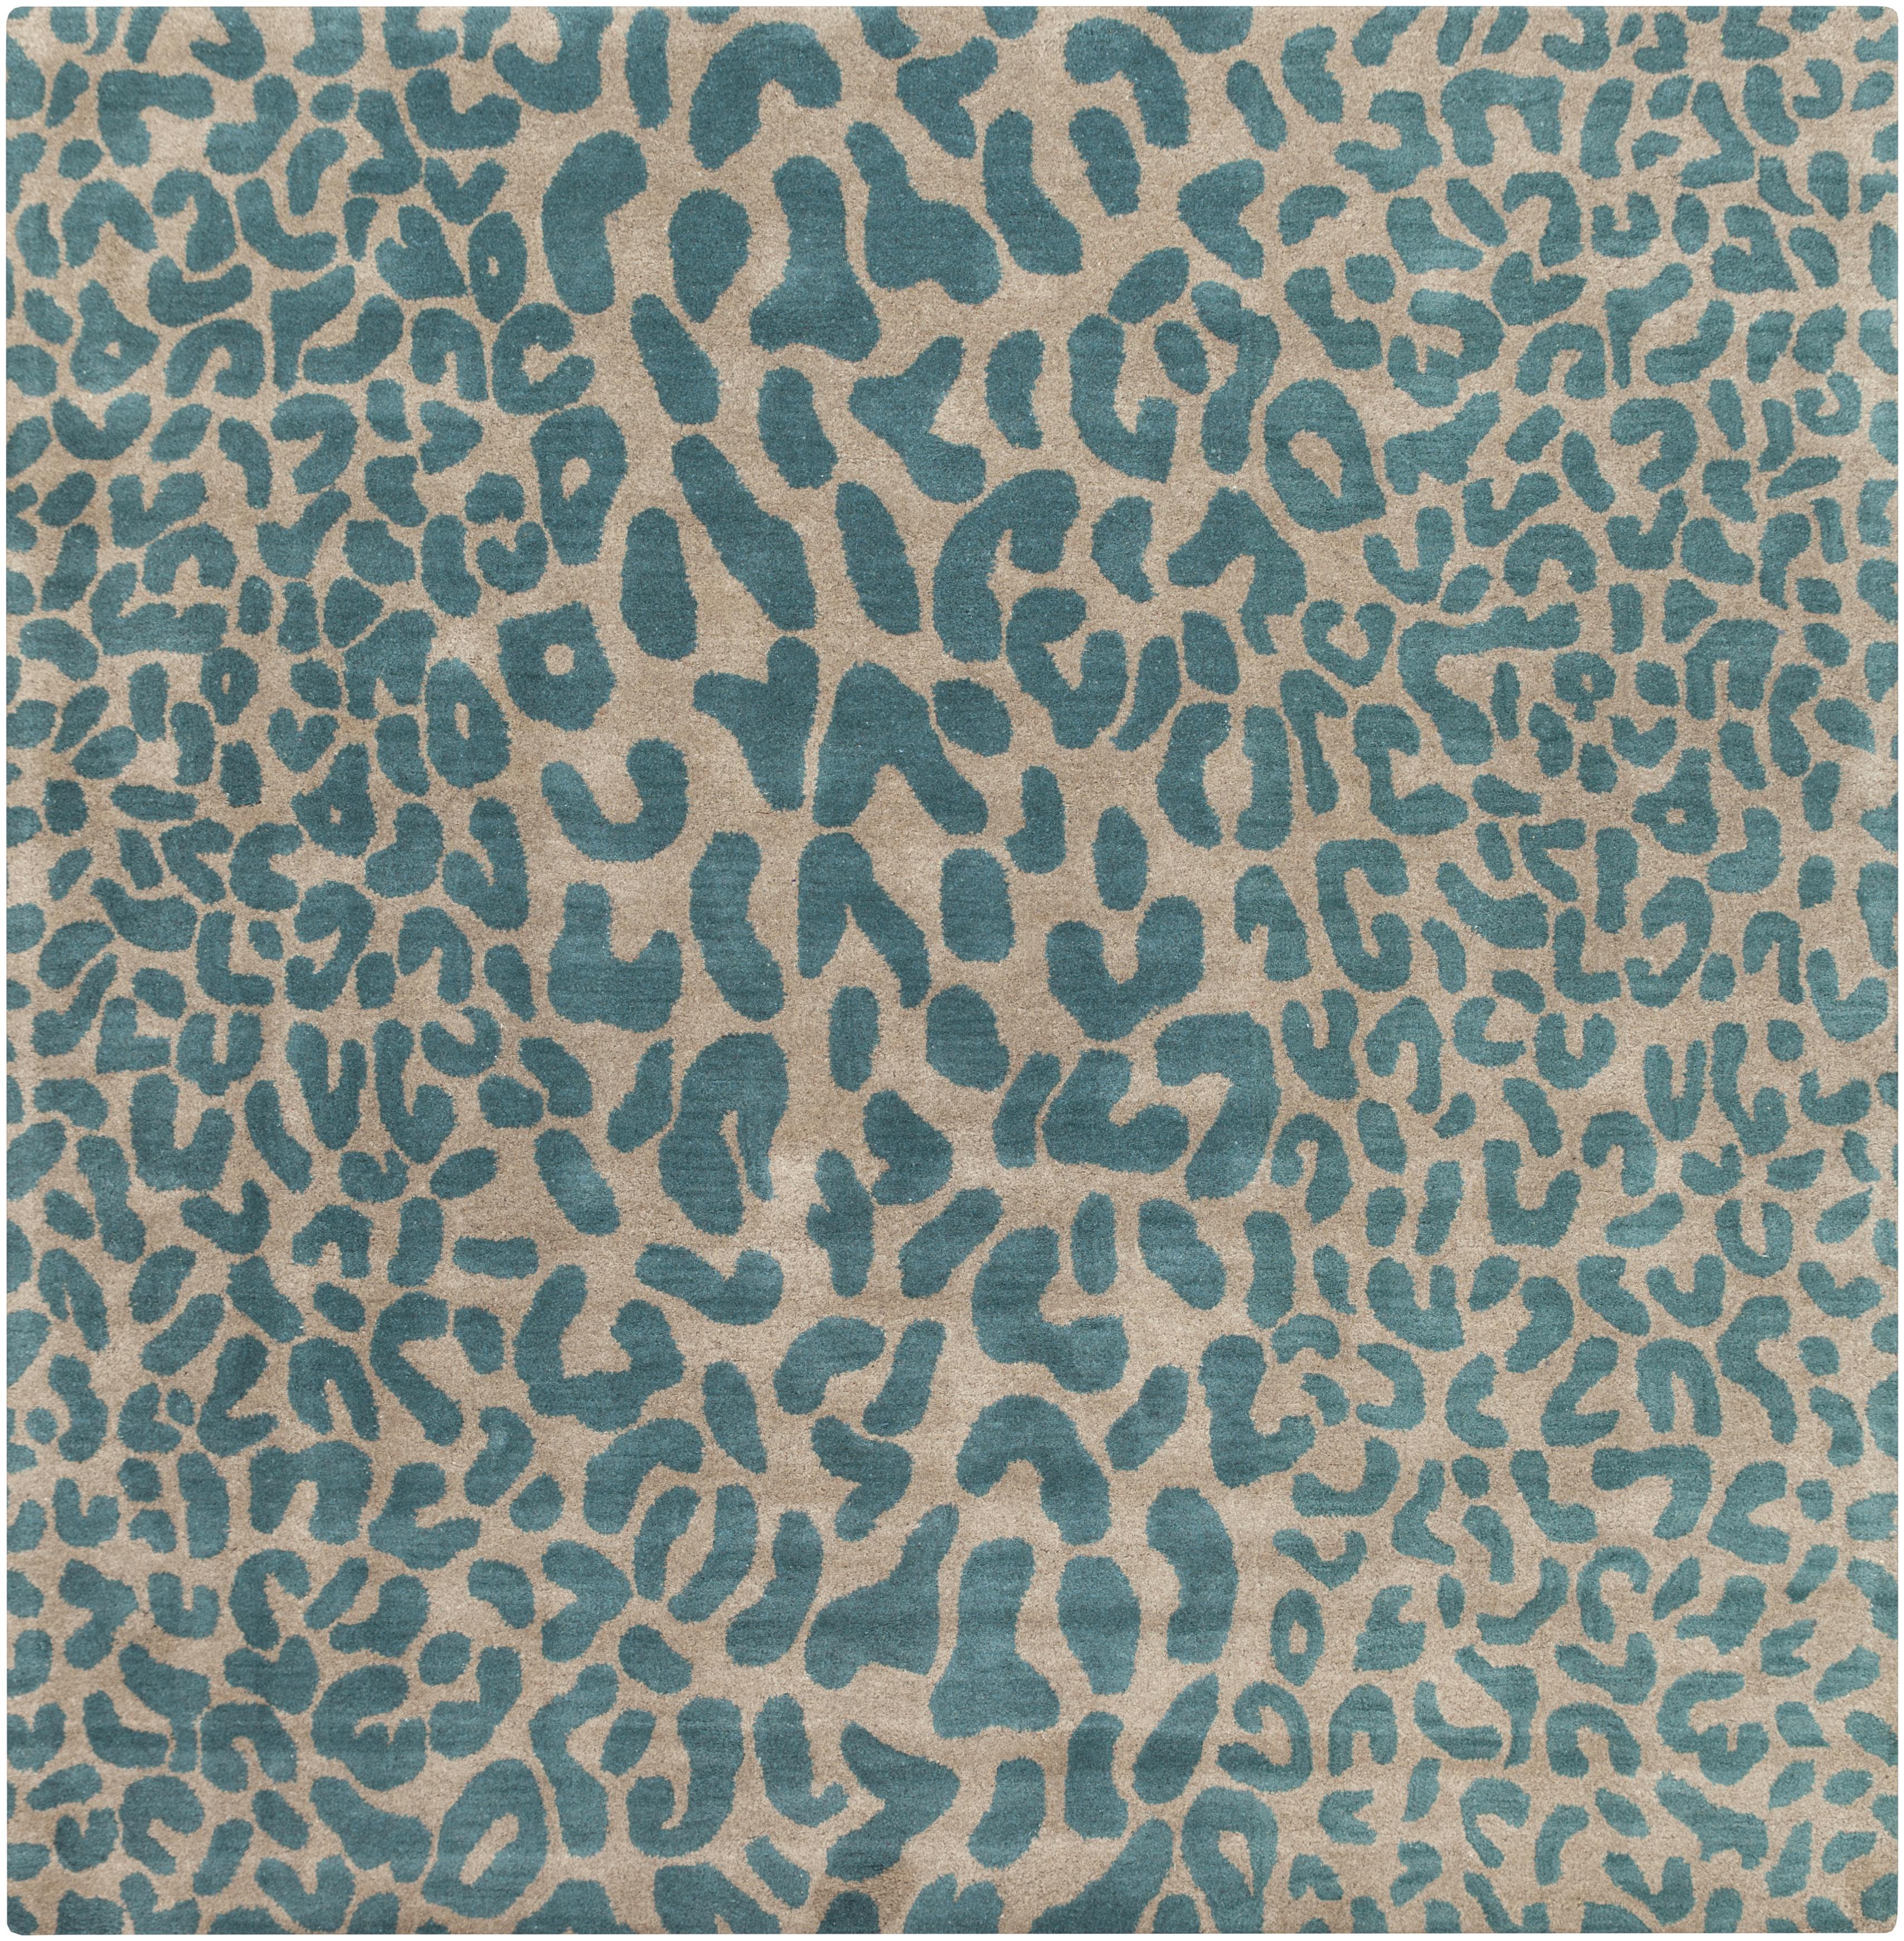 Athena 8' Square by Surya at Wayside Furniture